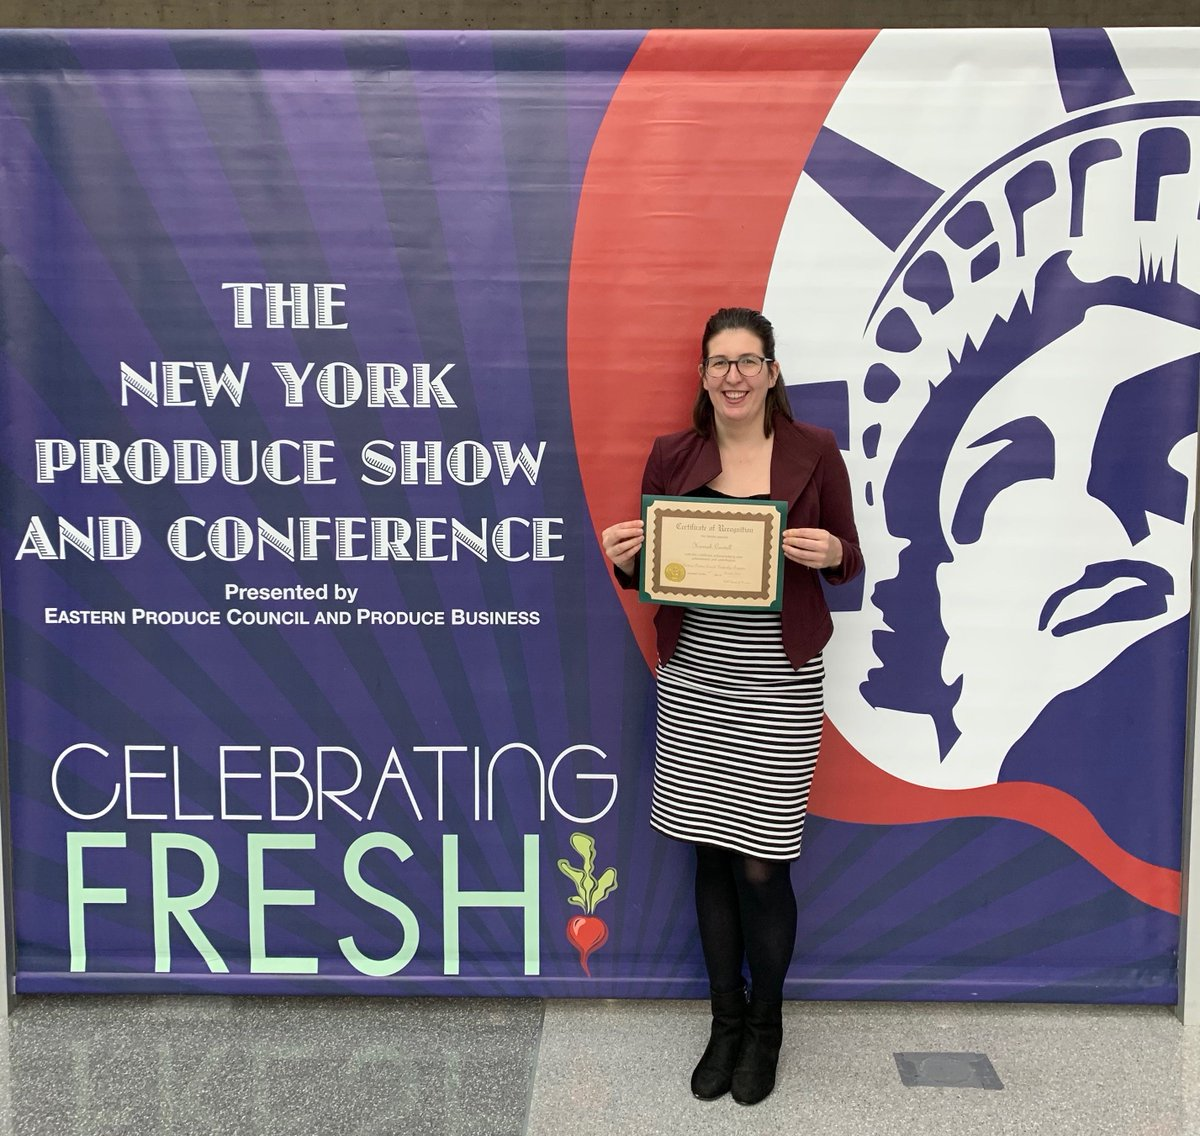 Congratulations @AeroFarms Hannah! 👏🏻